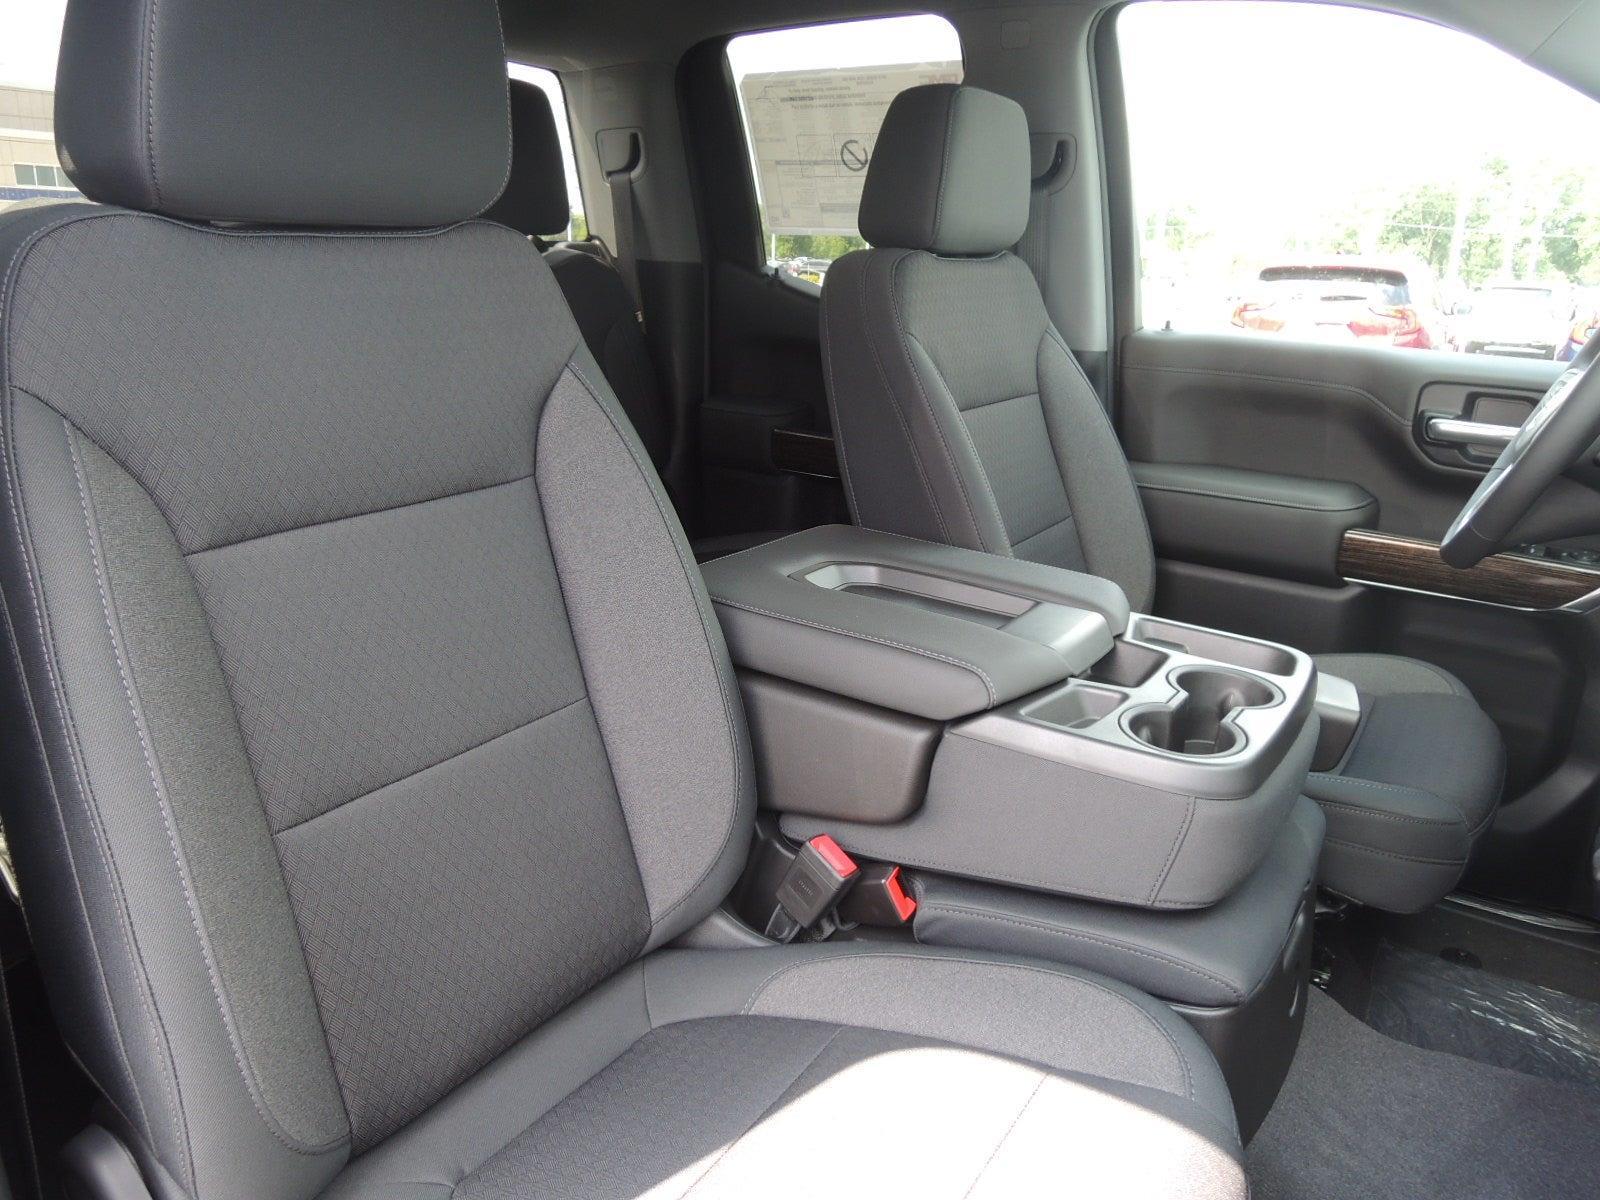 2021 GMC Sierra 1500 Double Cab 4x2, Pickup #MT714 - photo 15